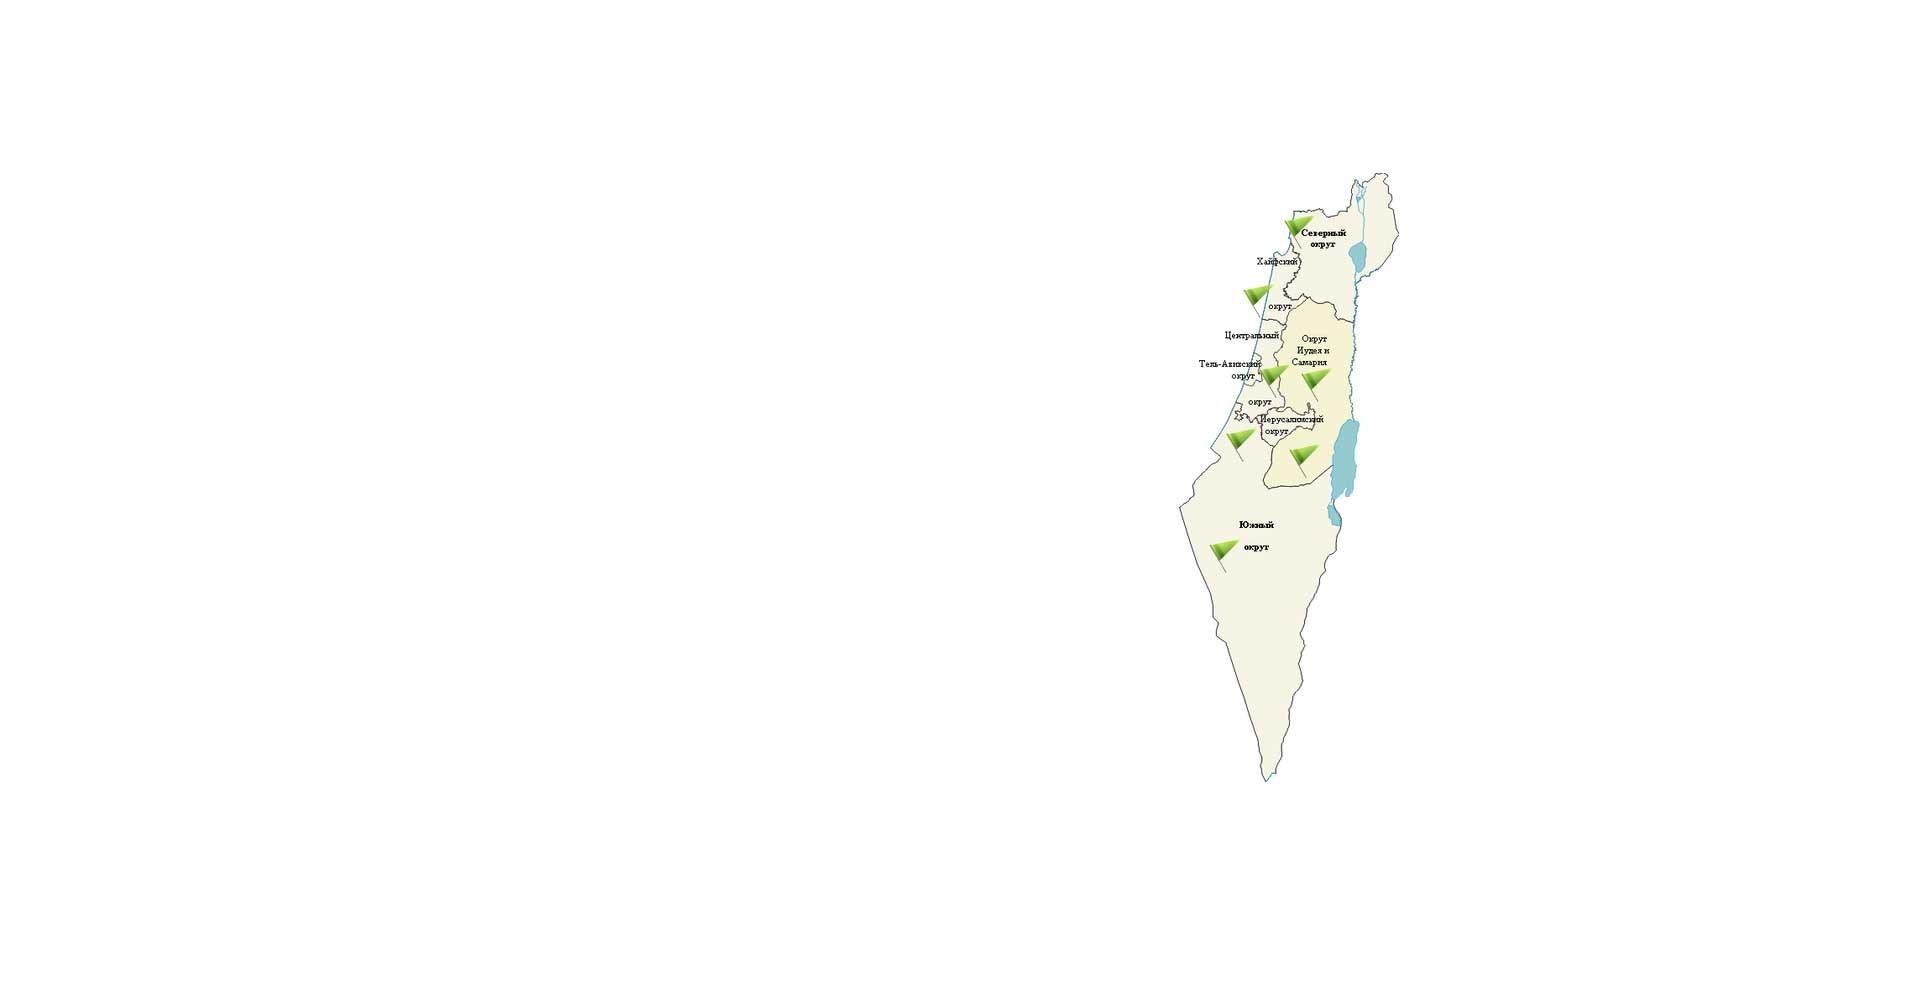 Карта Дистрибьюции